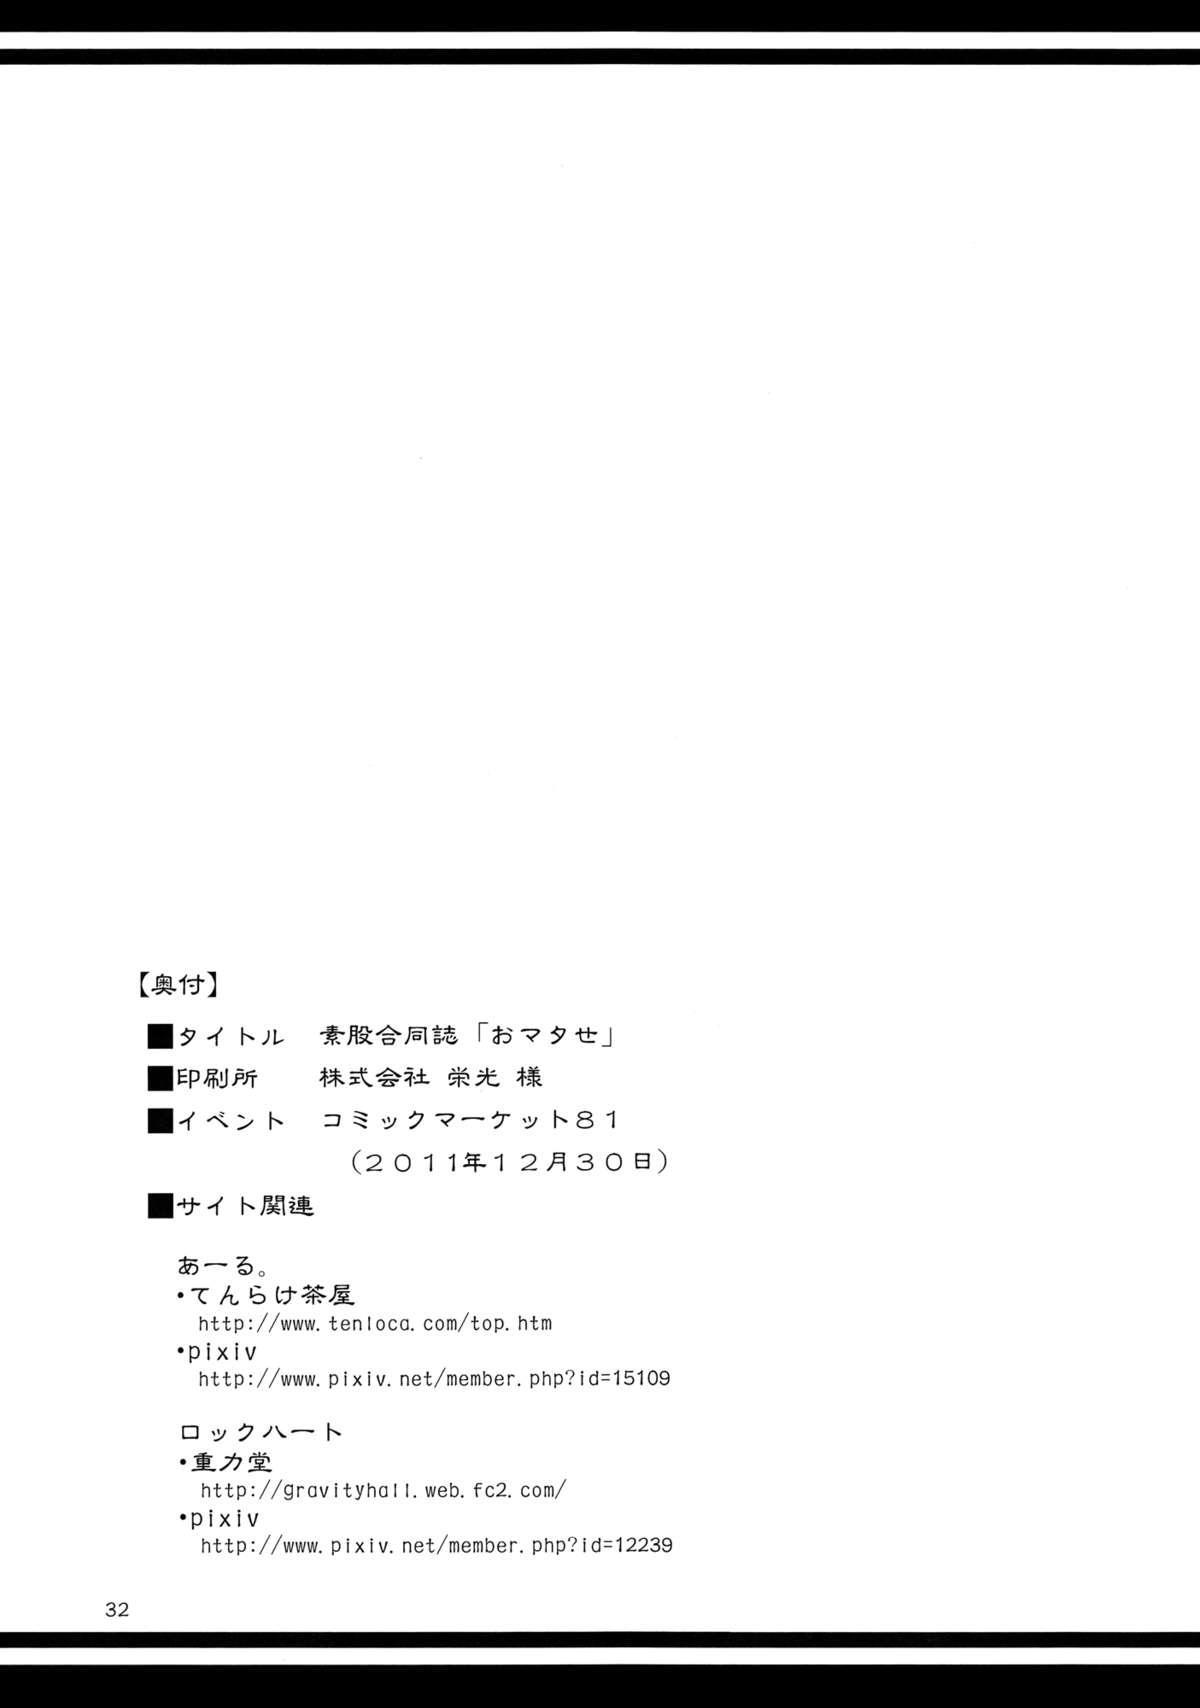 Sumata Goudoushi Omatase 32